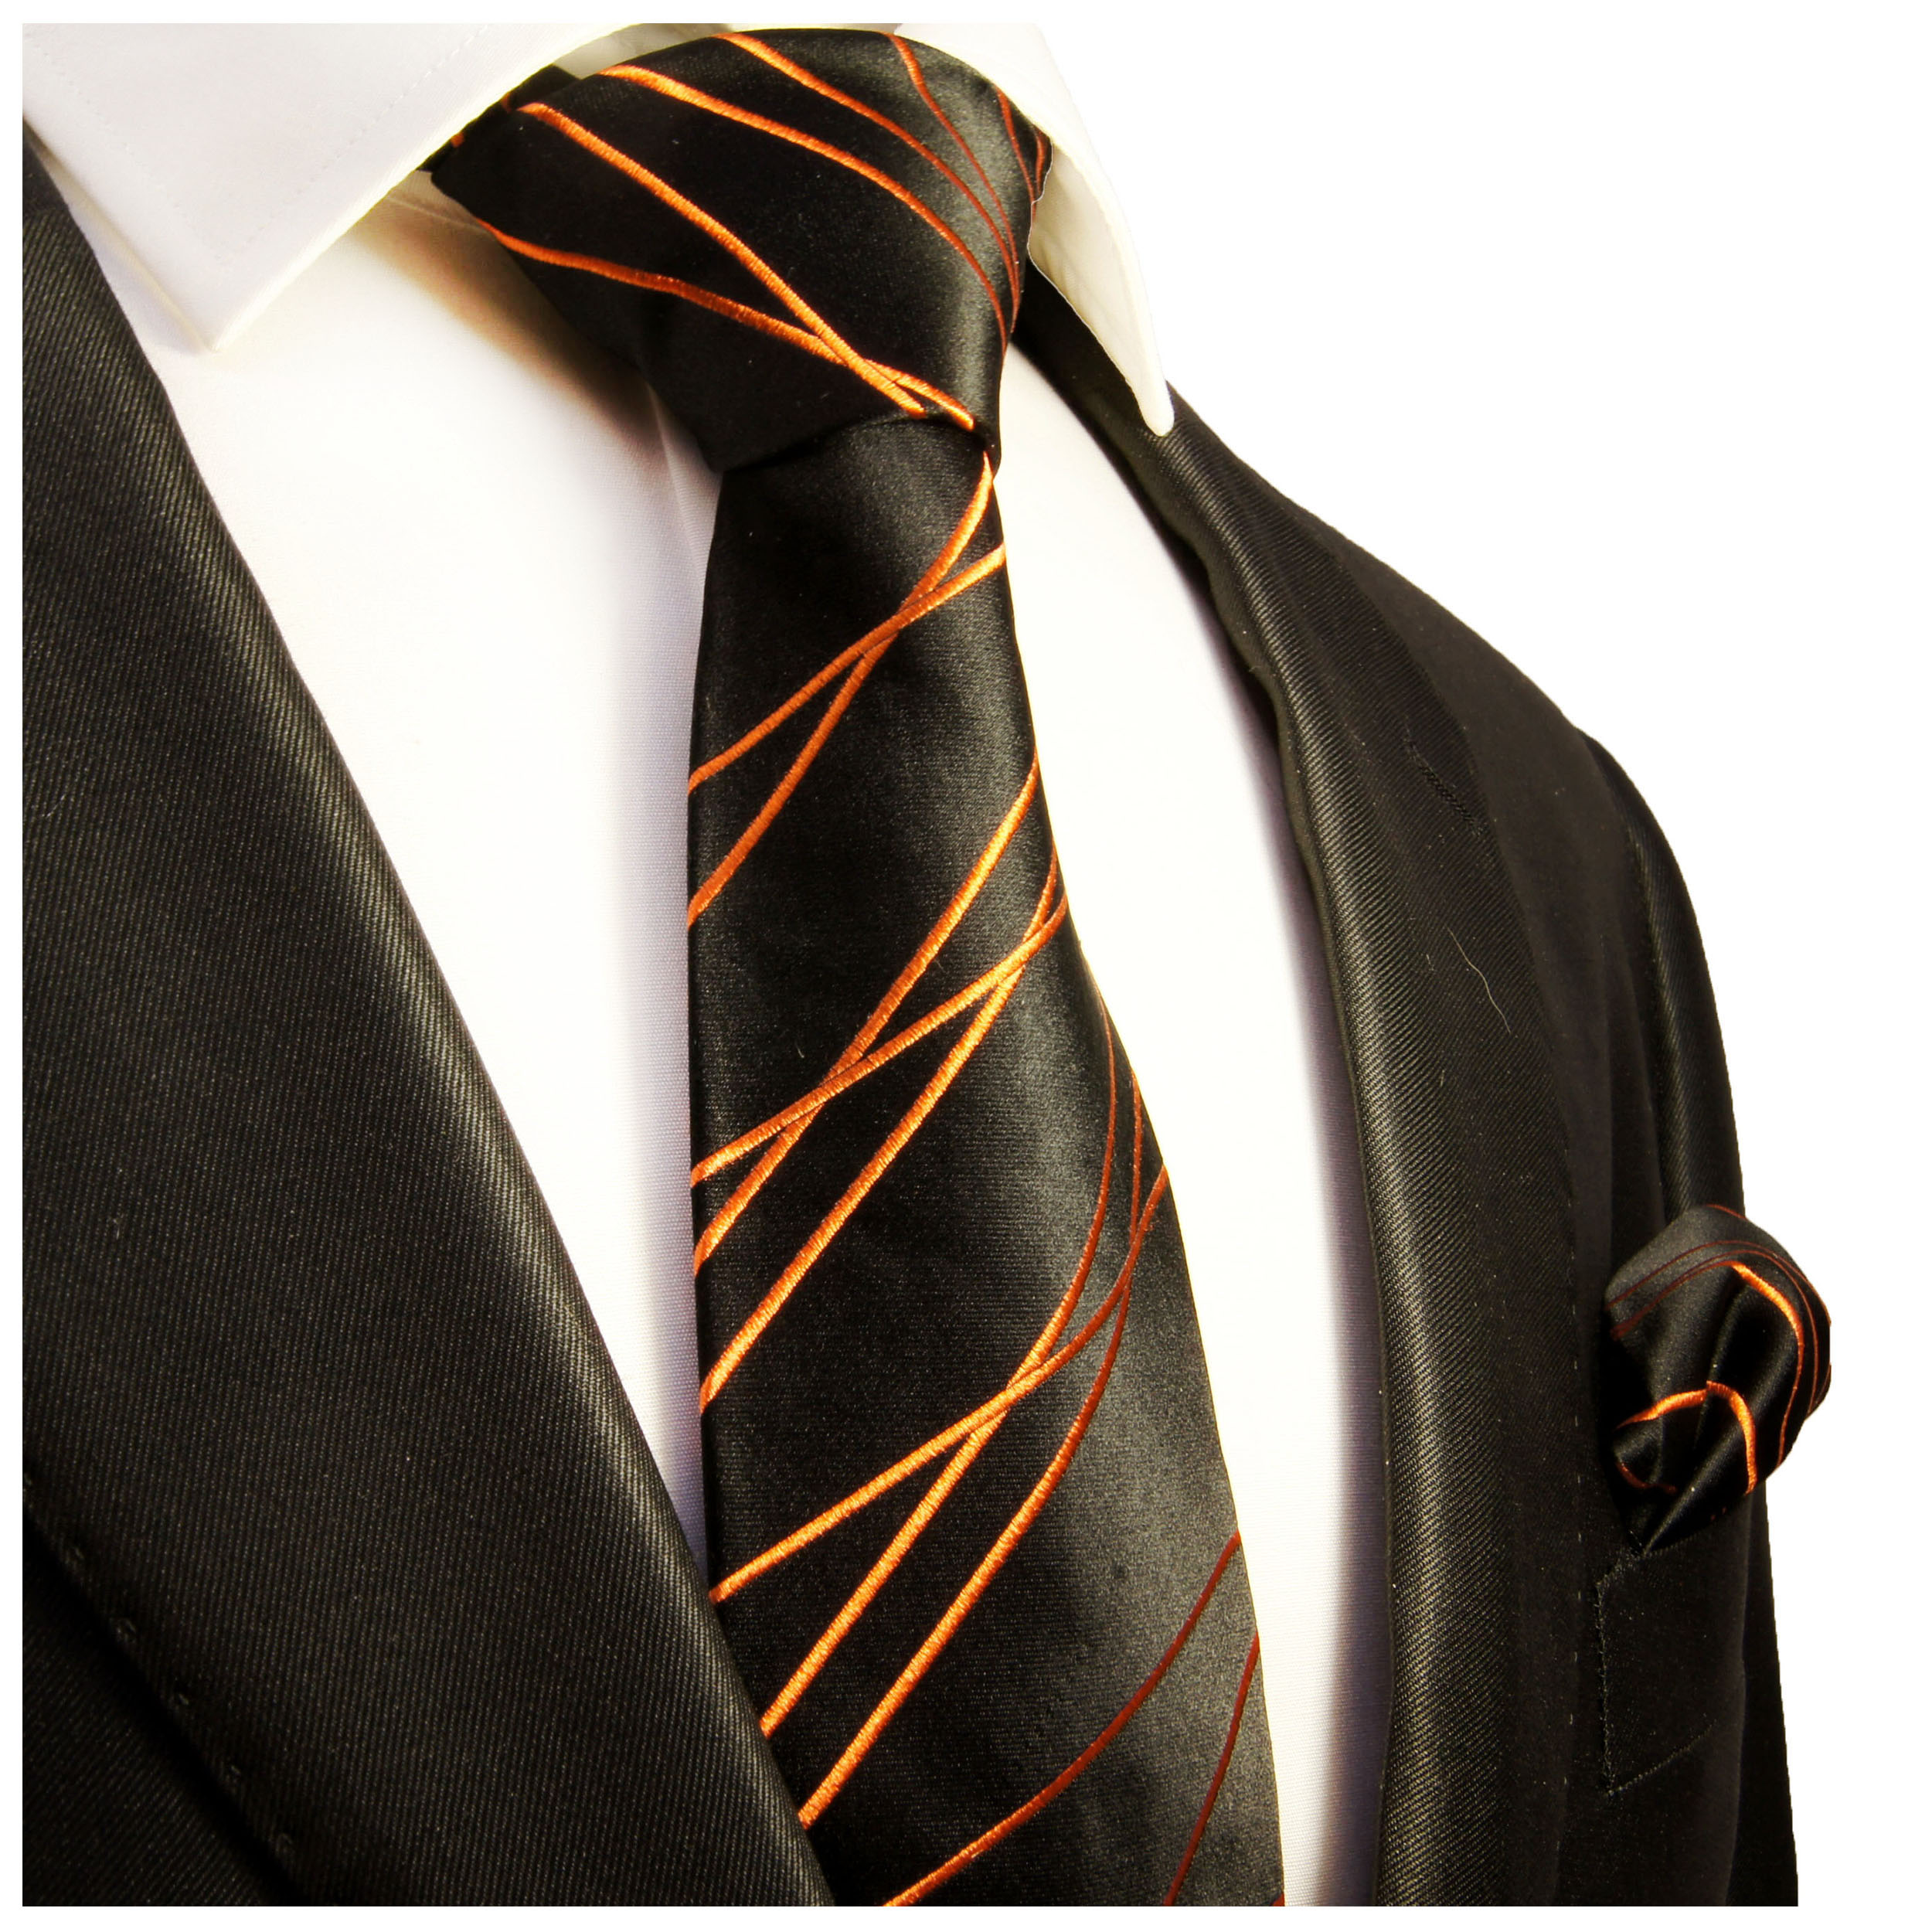 paul malone shop schwarz orange krawatte 100. Black Bedroom Furniture Sets. Home Design Ideas